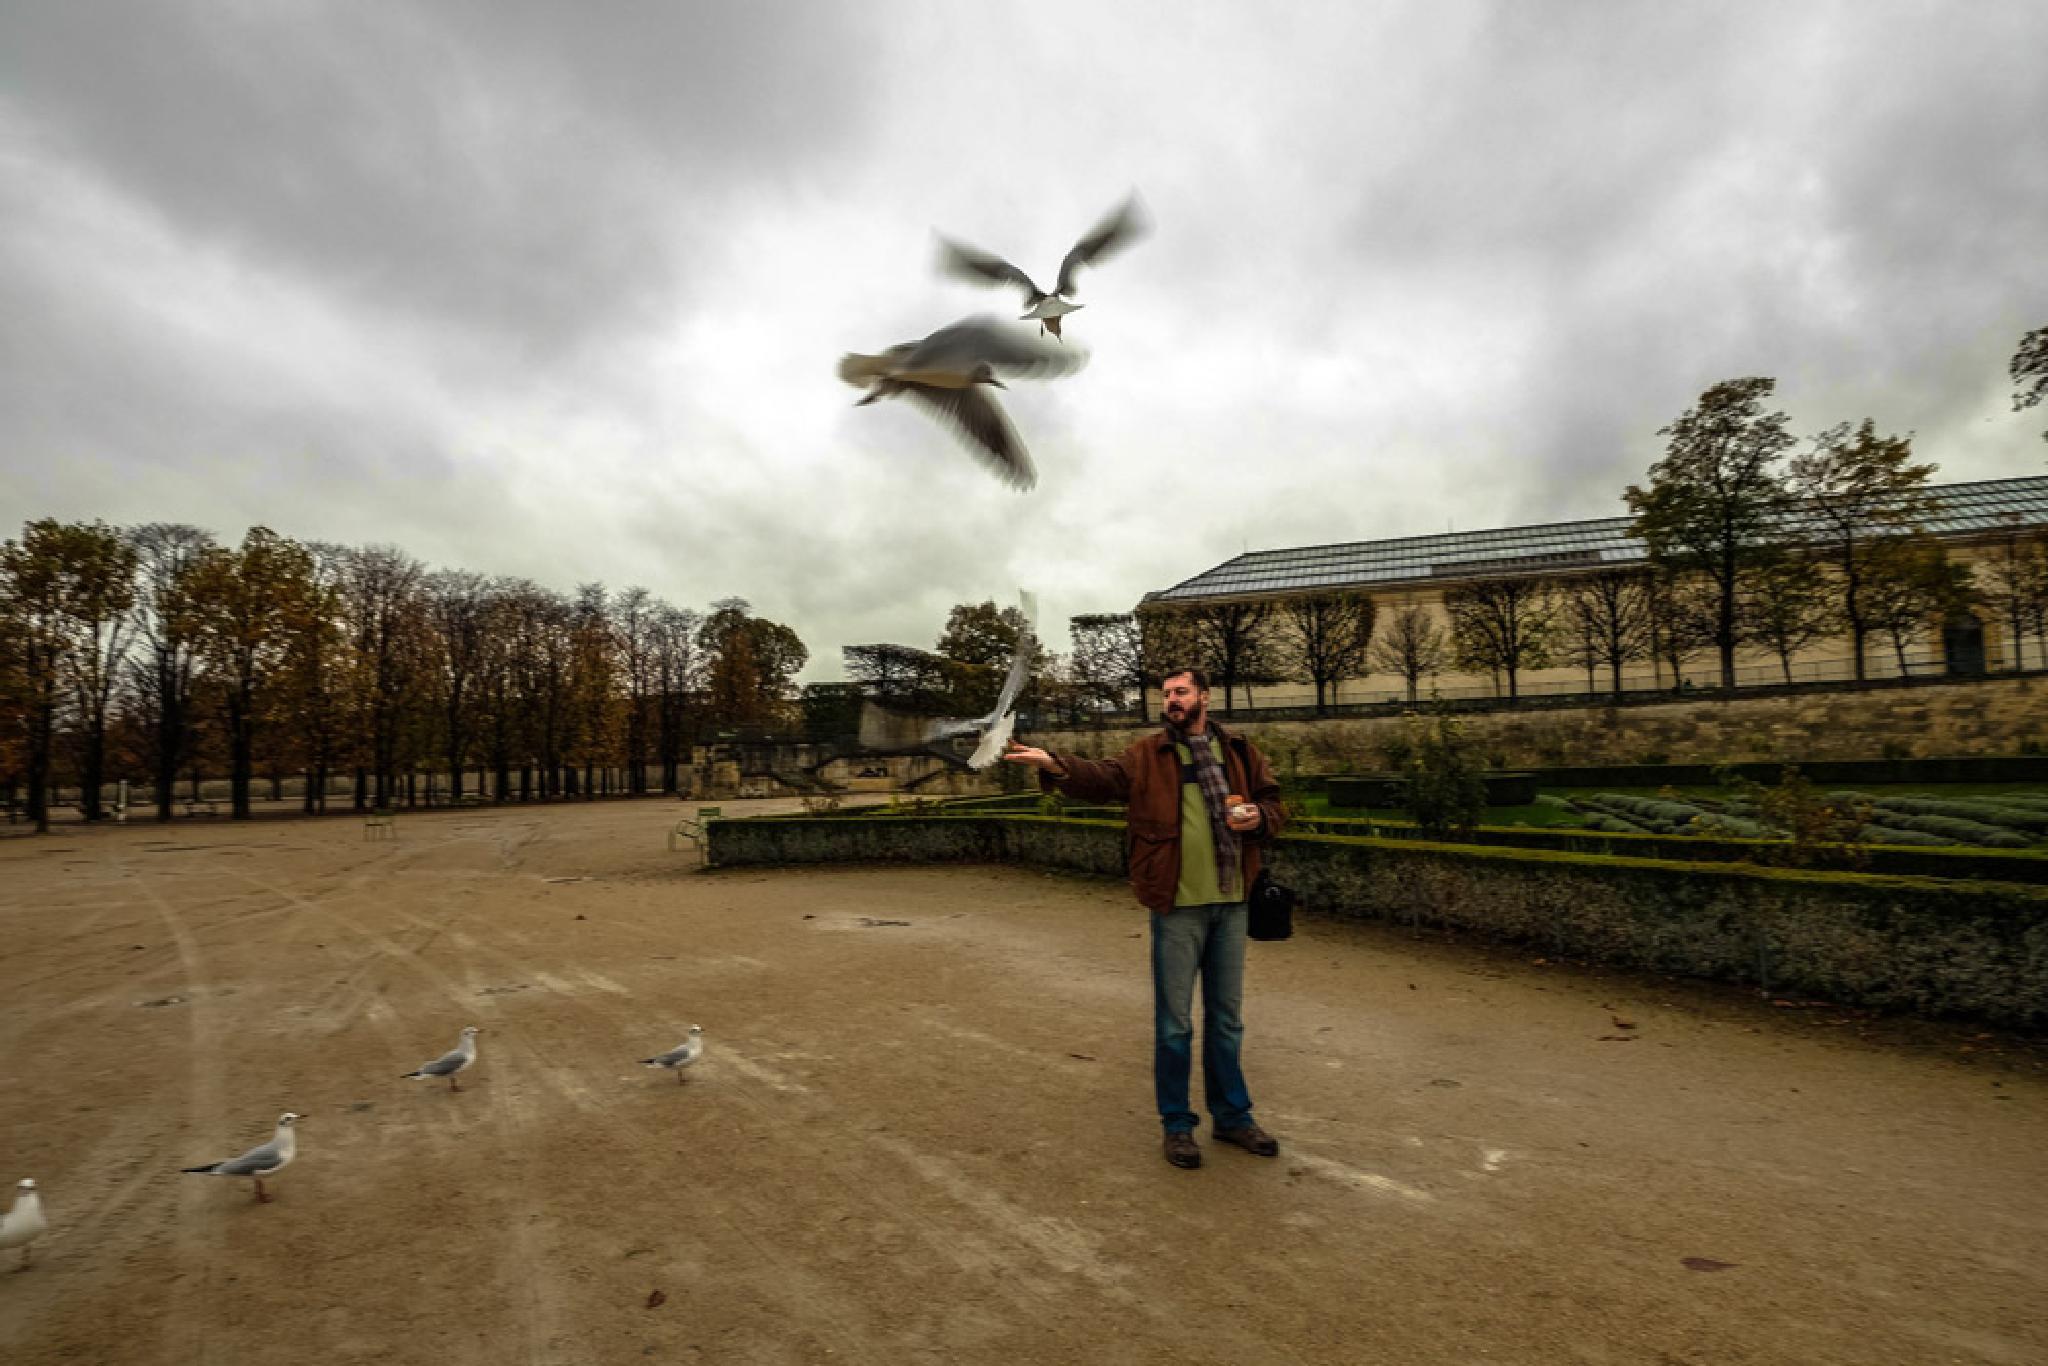 Untitled, Paris 2014 by dxbimran